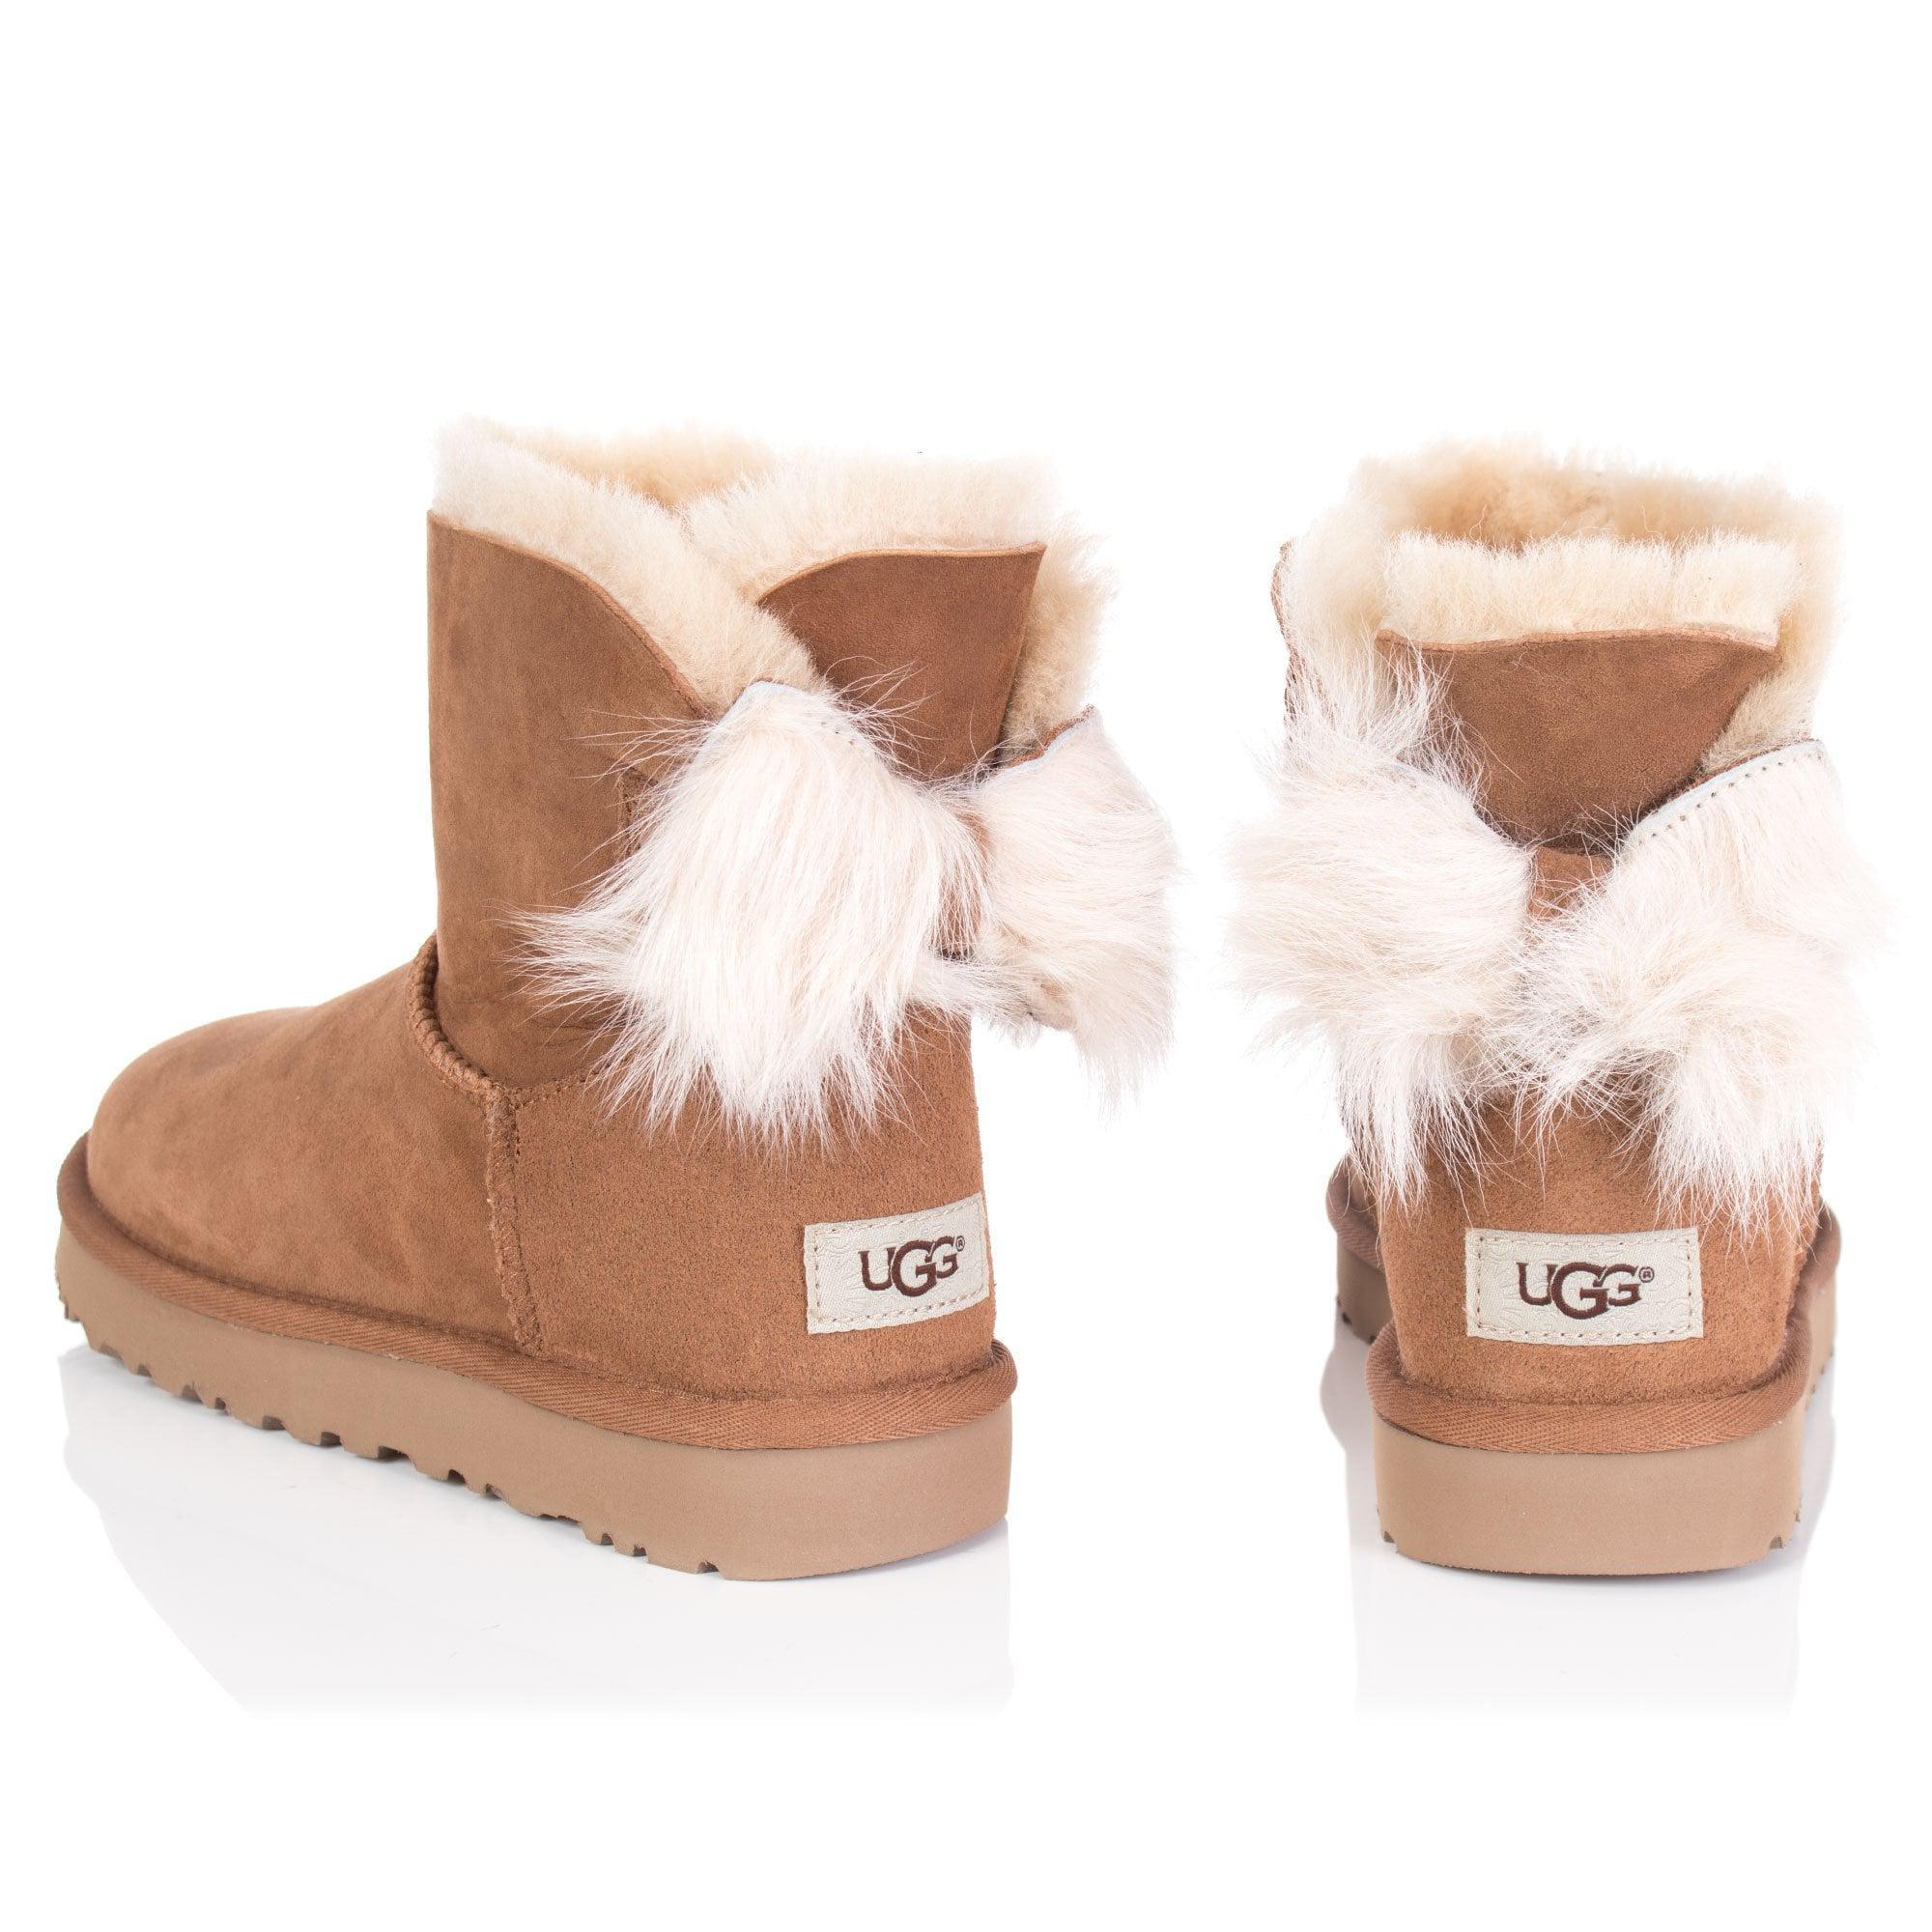 1c5fe3b71c8 UGG Fluff Bow Mini Boot in Brown - Lyst